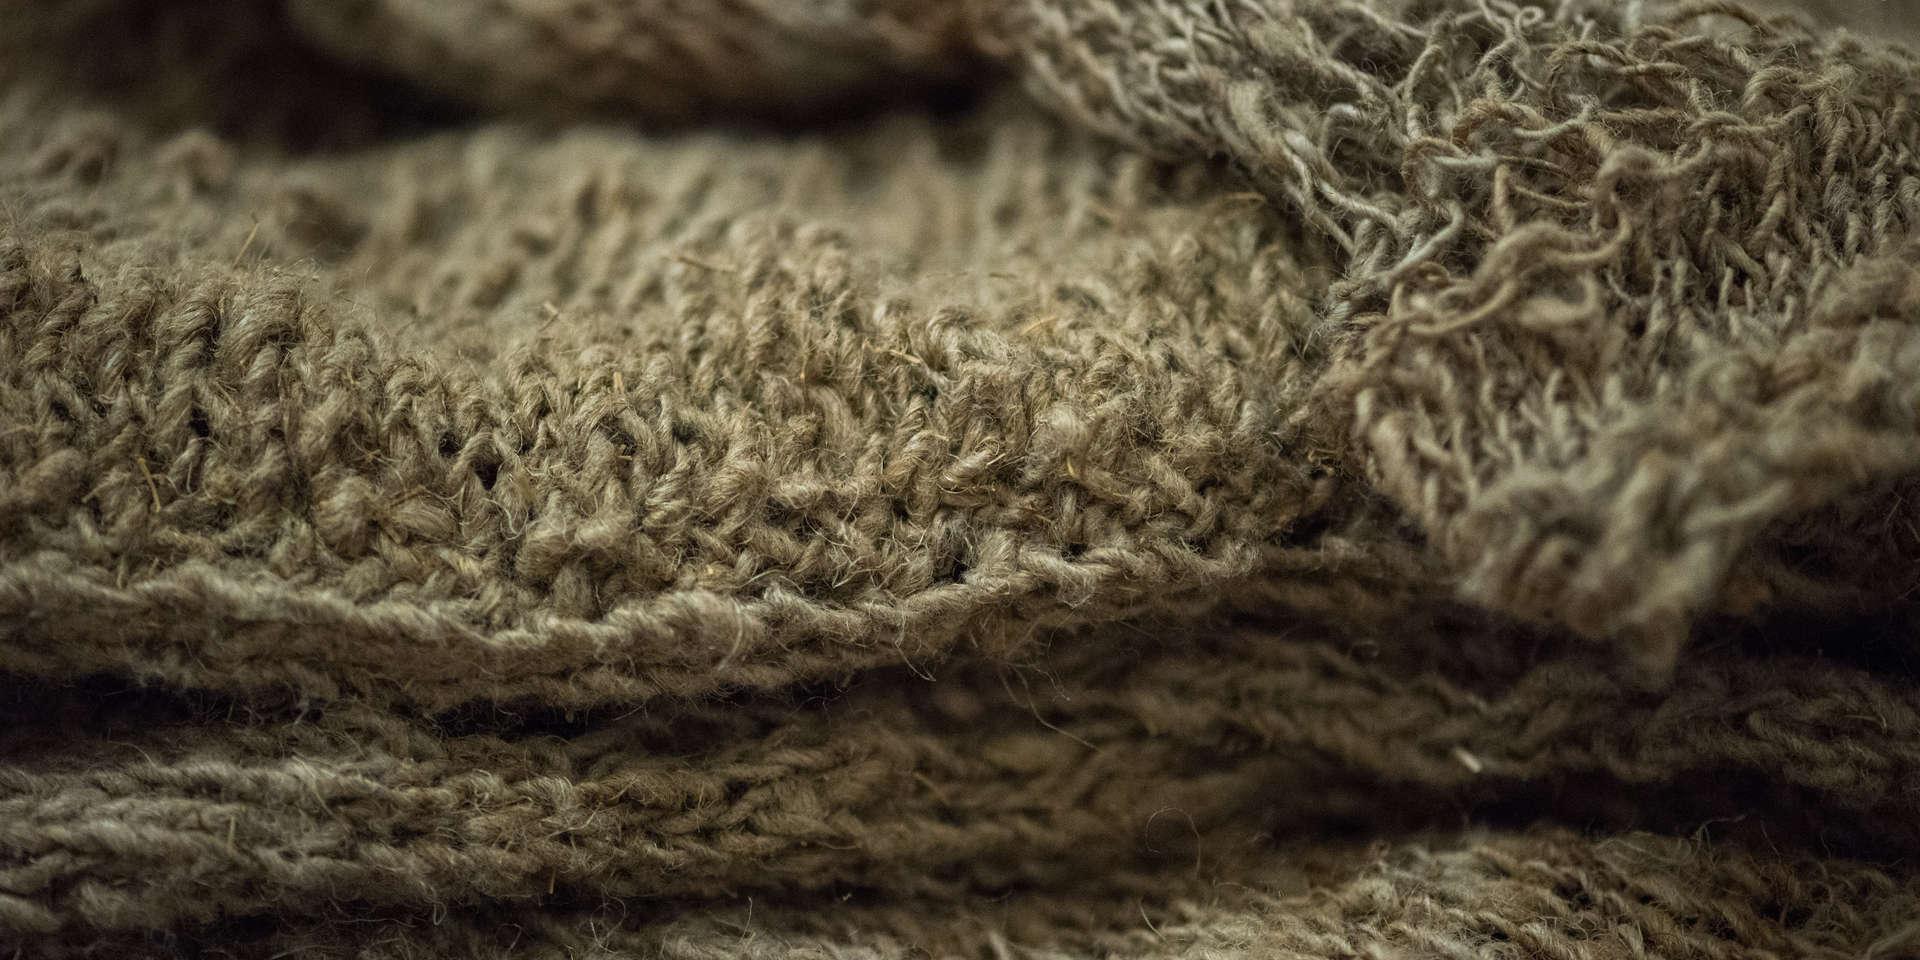 Wild Swans, Abridged (detail9); nettle silk, ramie; 240x159x166cm; photo A Thompson; Fiona Percy 2018